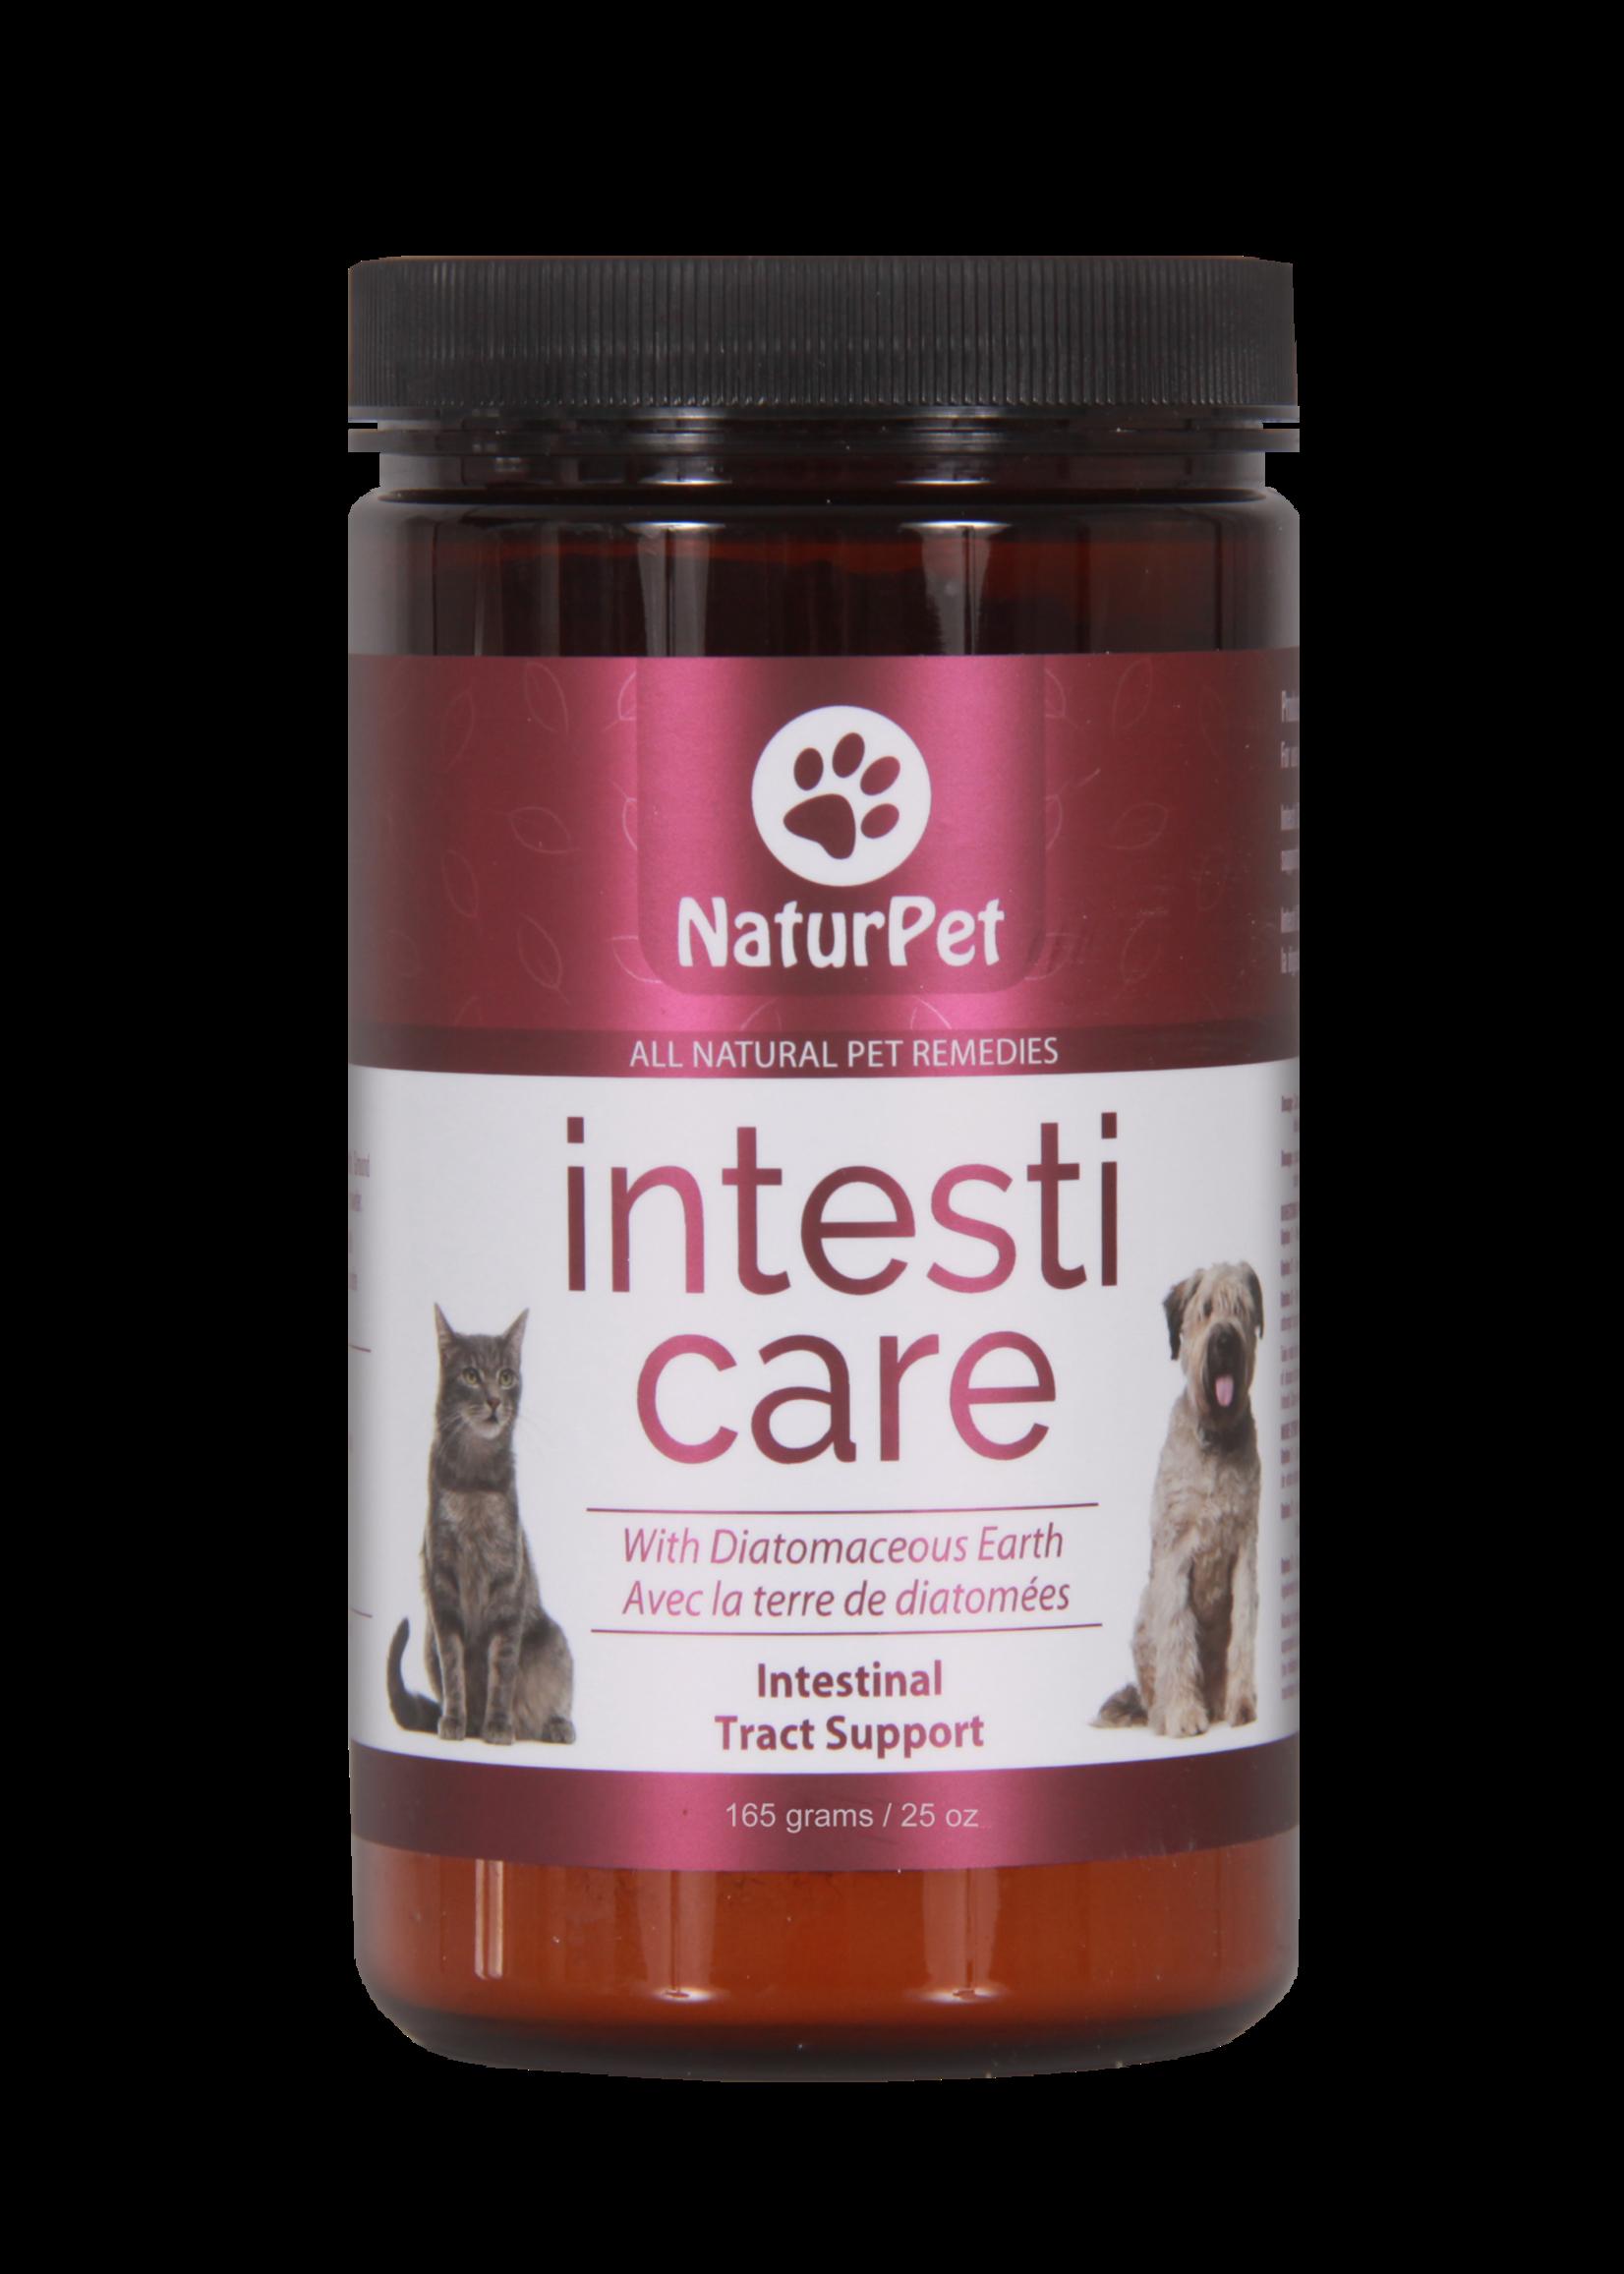 NaturPet® Naturpet Intesti-care with diamotaceous earth 25oz